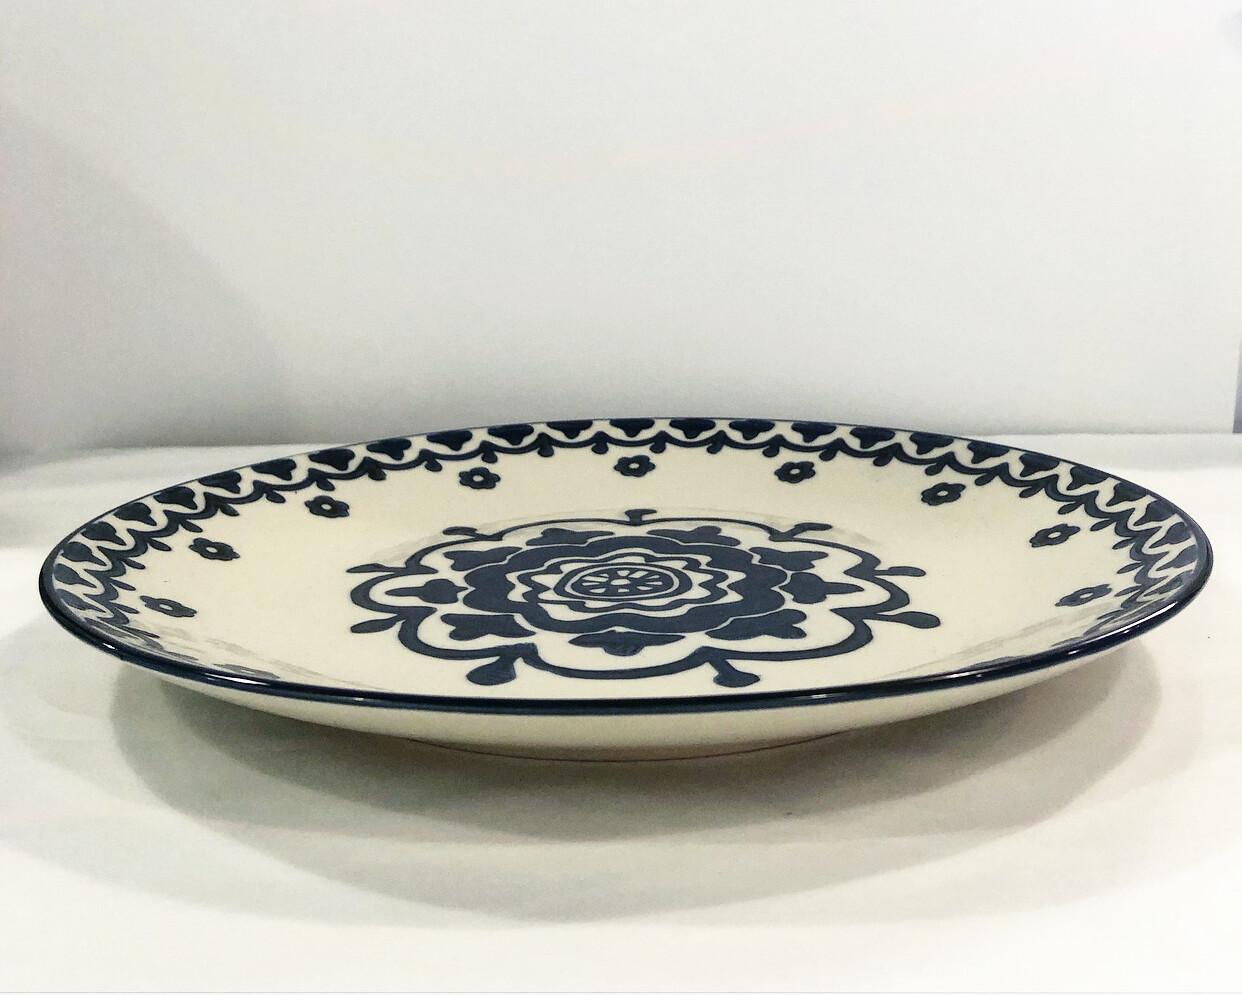 CC INTERIORS- Serving Platter-PORTO Collection28.5cm